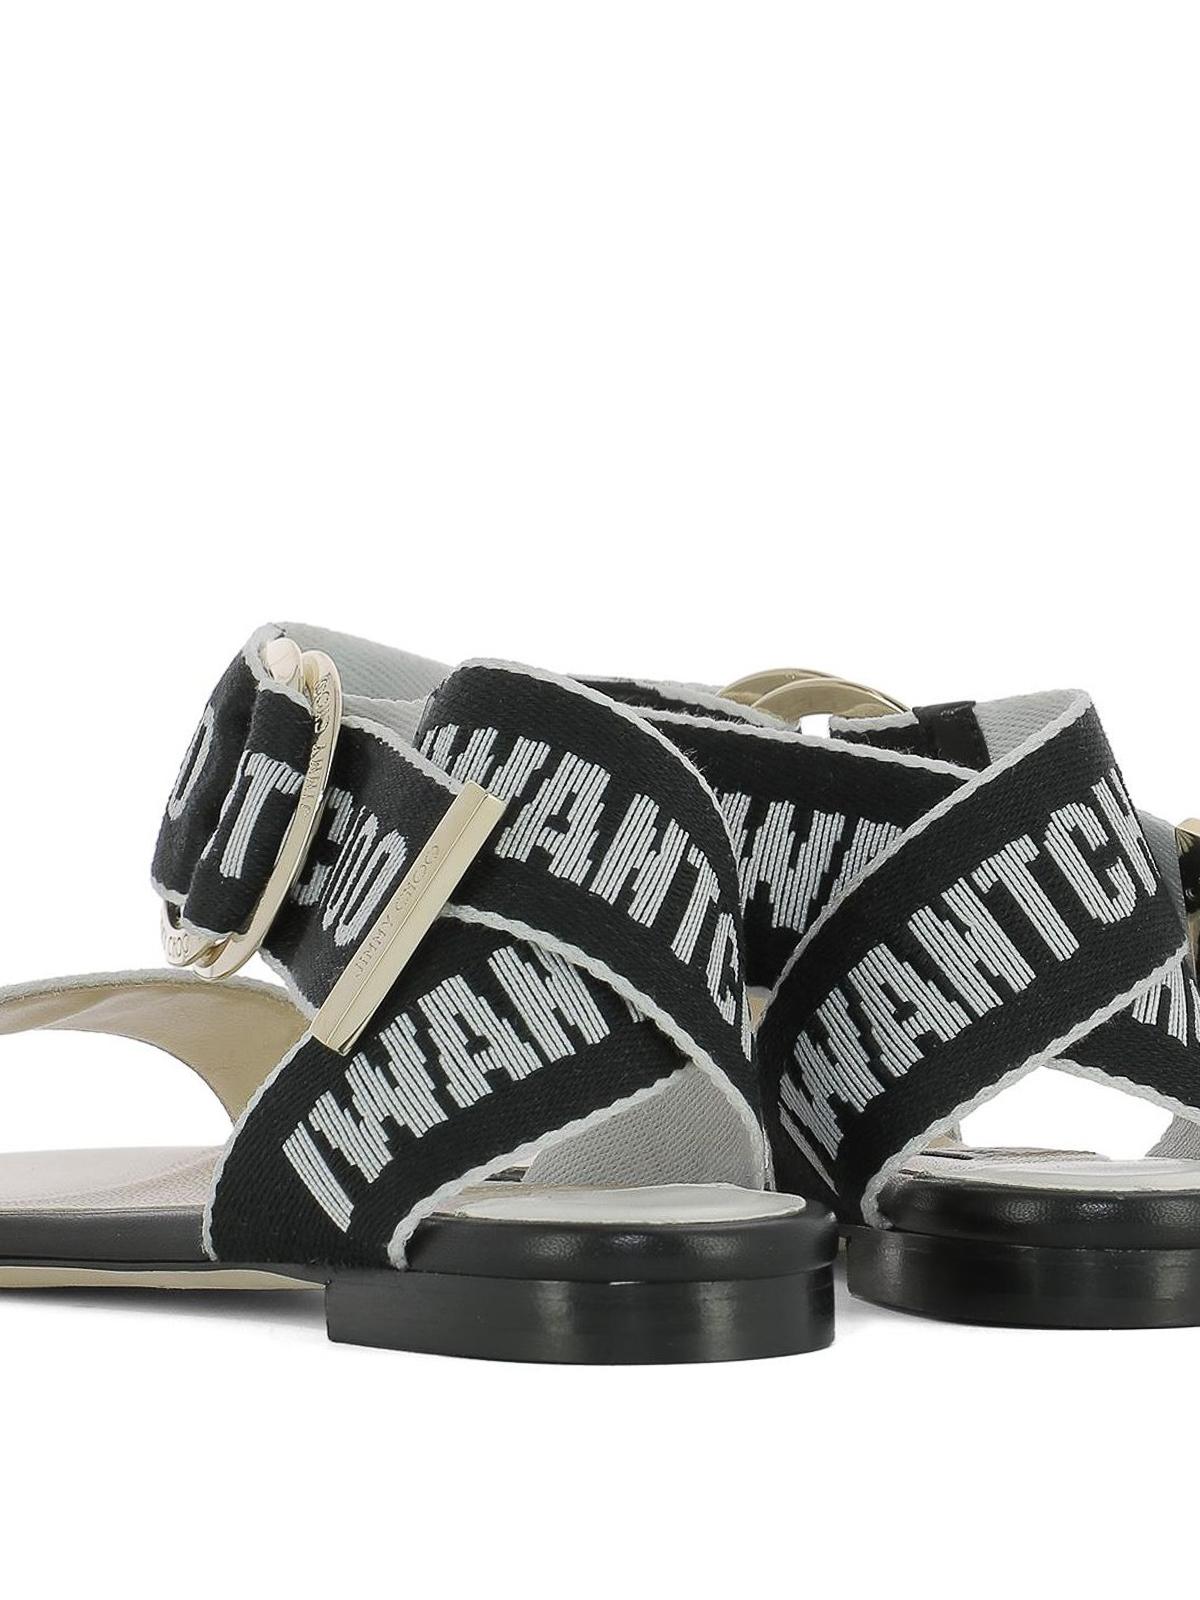 880e1139a43 Jimmy Choo - Breanne black and chalk logo tape sandals - sandals ...